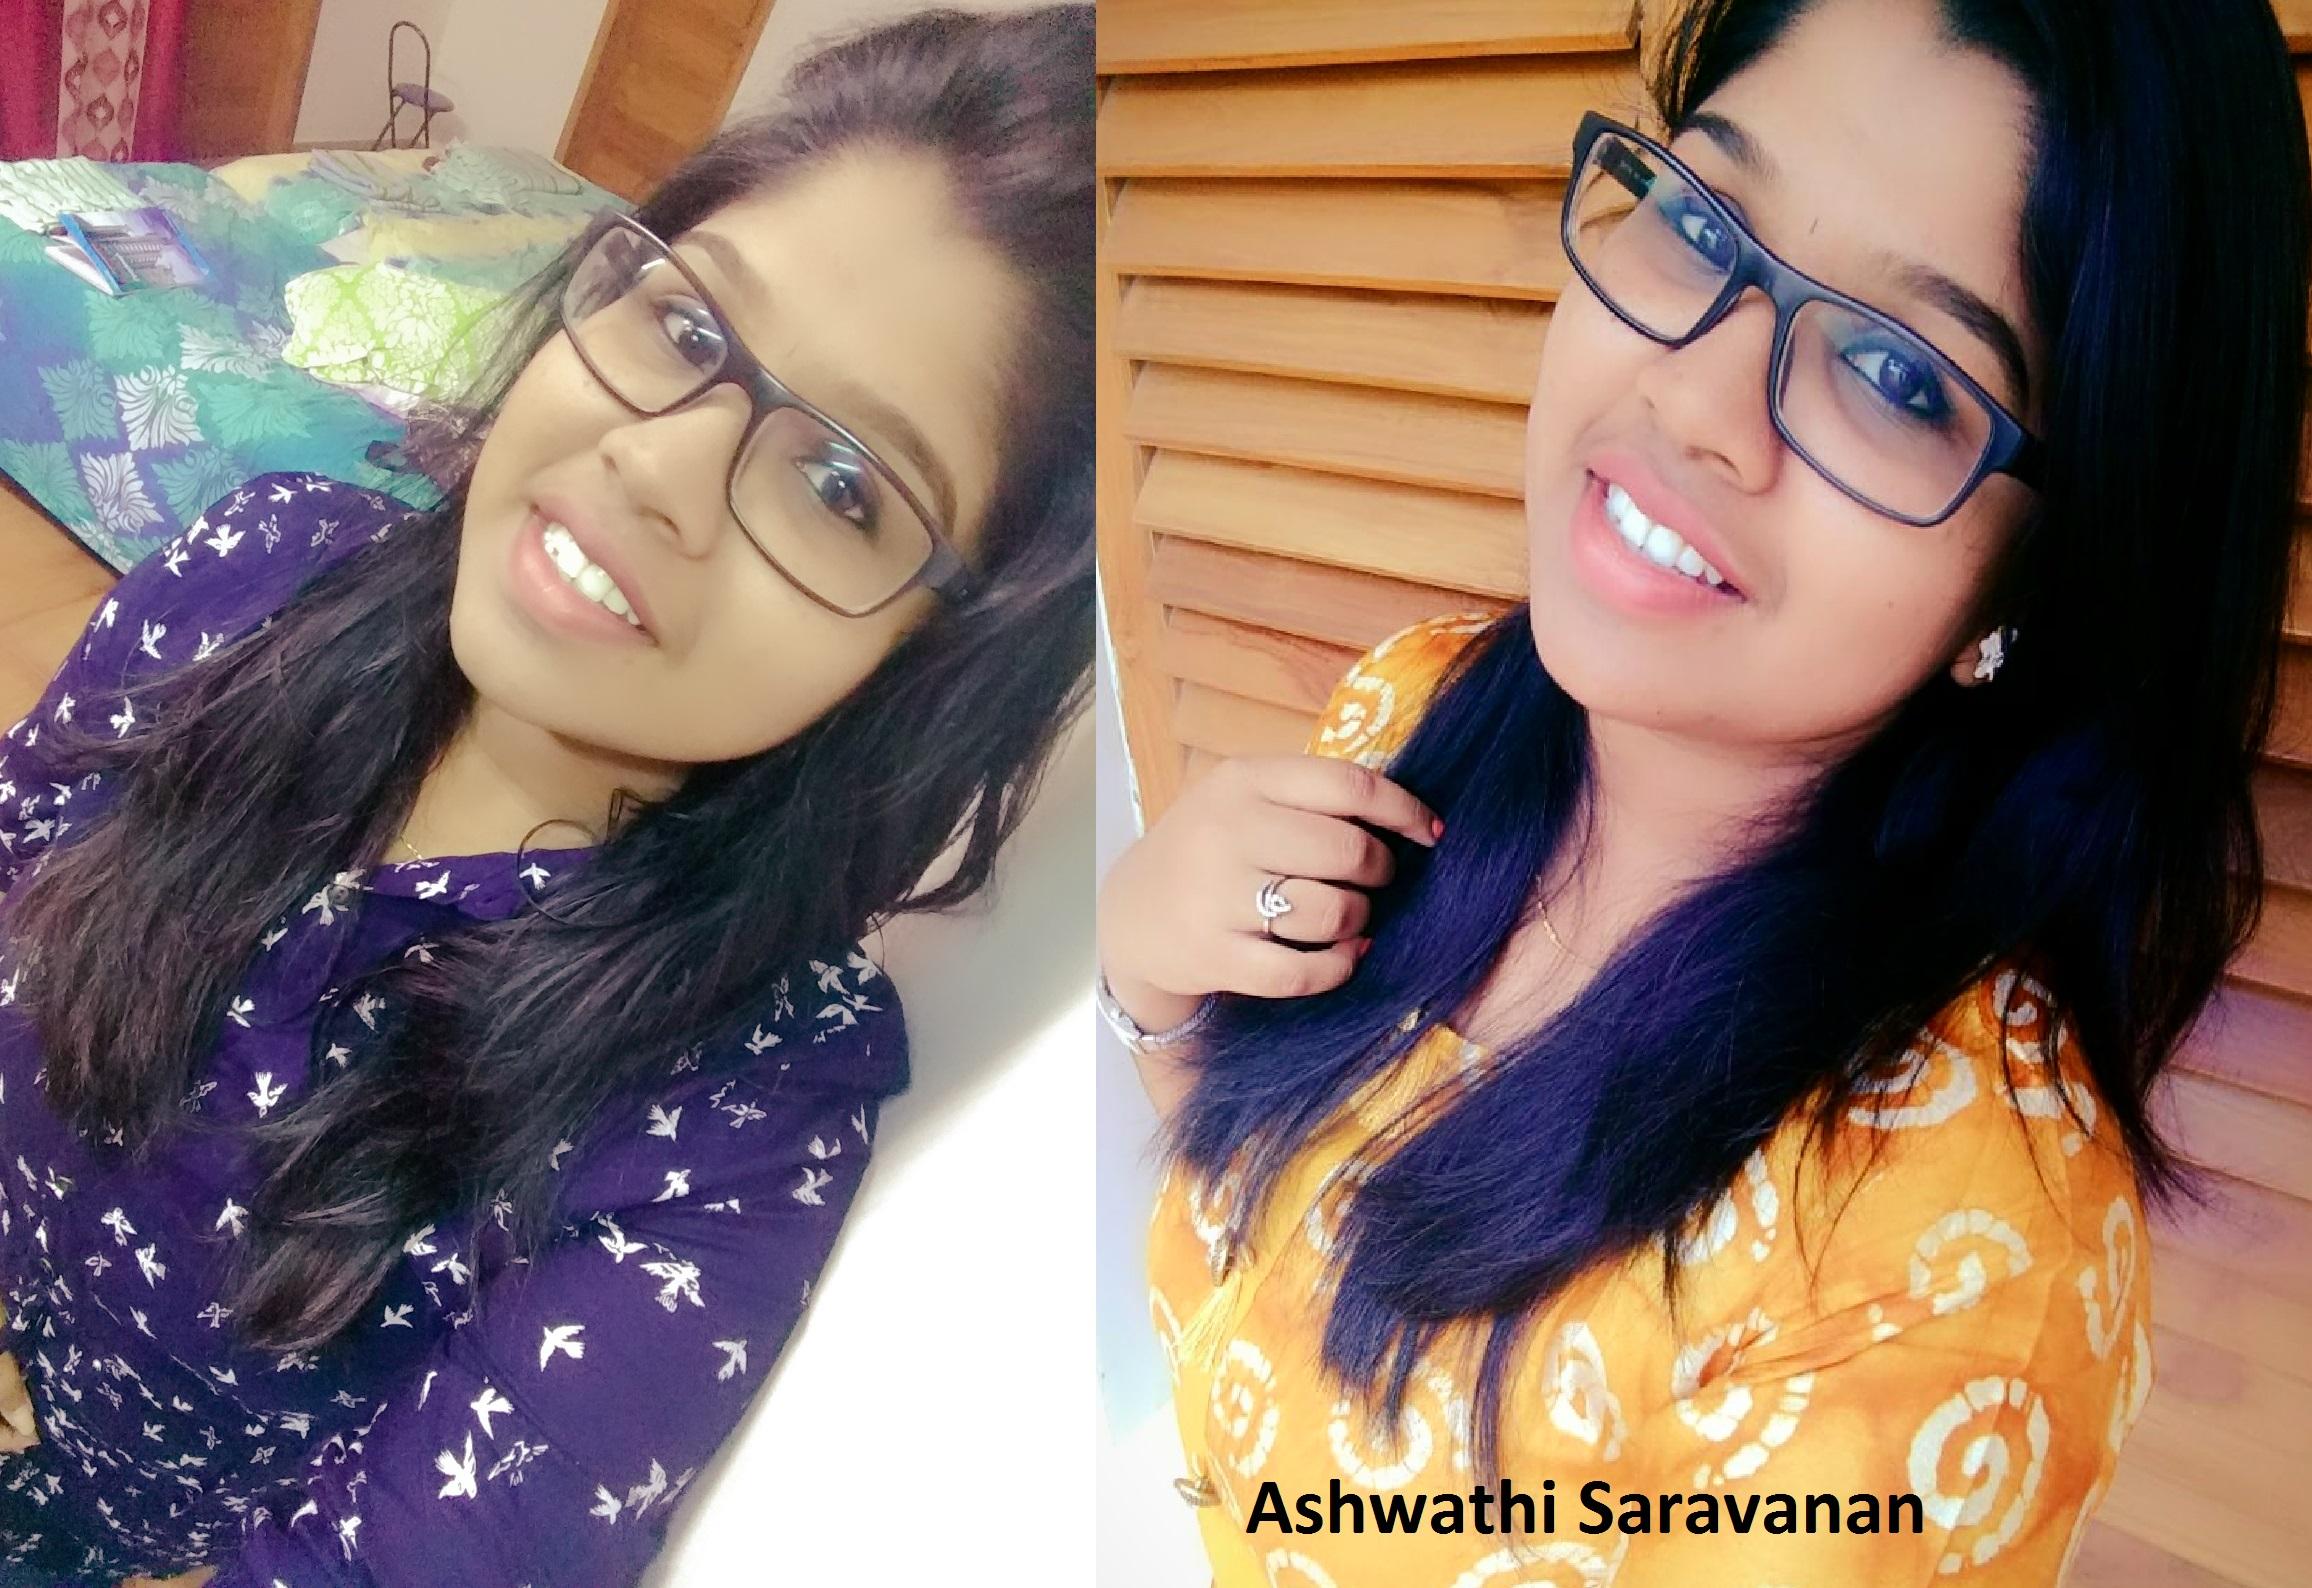 Ashwathi Saravanan